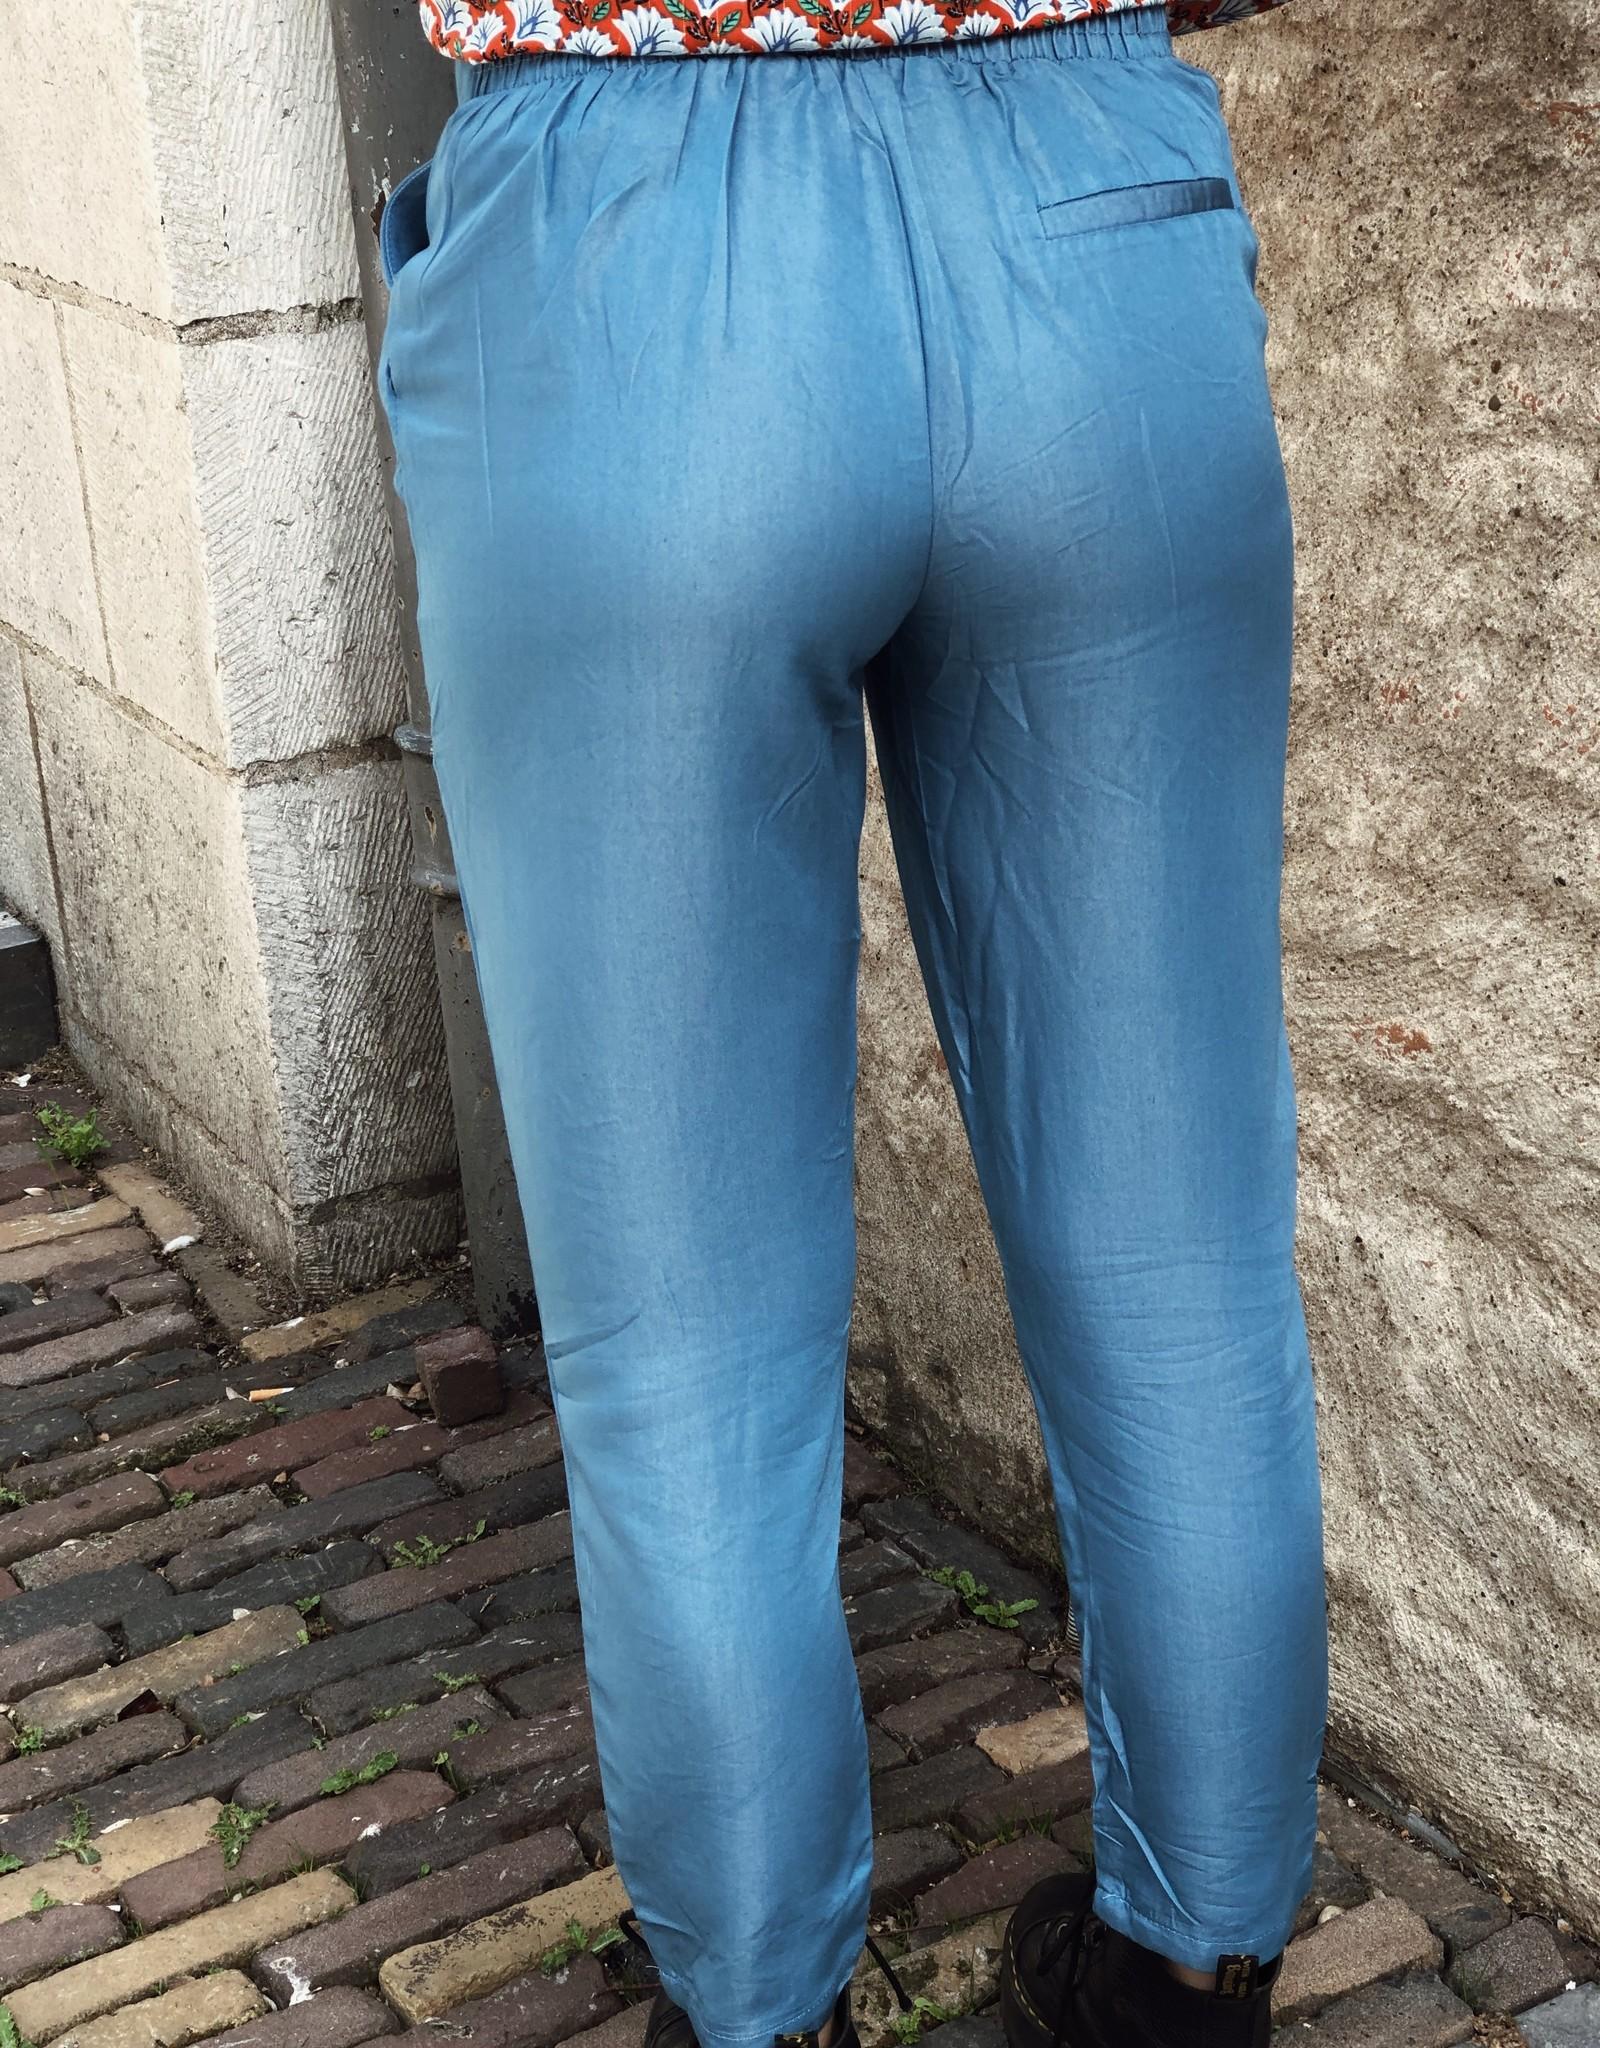 Make My Day Make My Day Pantalon Thin Denim